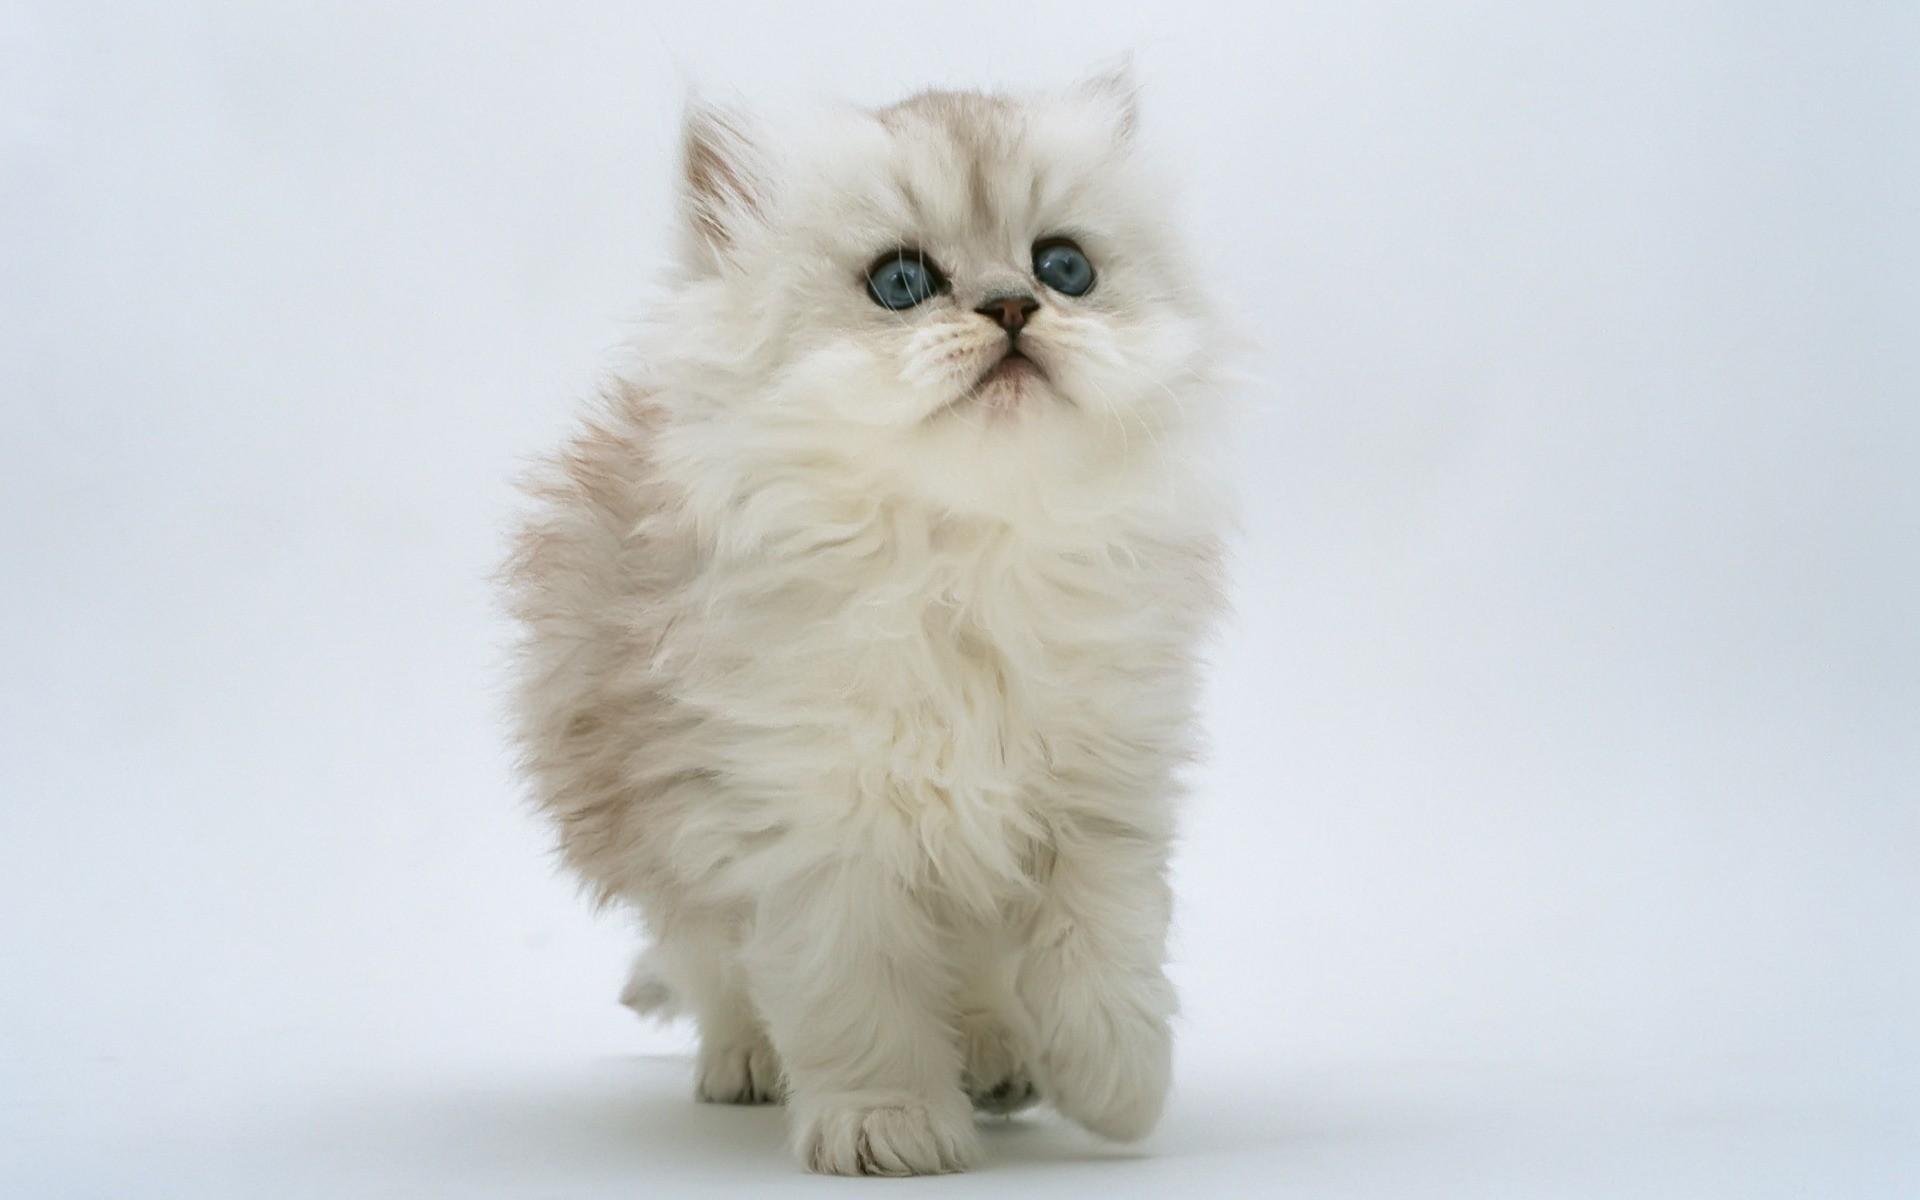 Gato blanco hermoso - 1920x1200